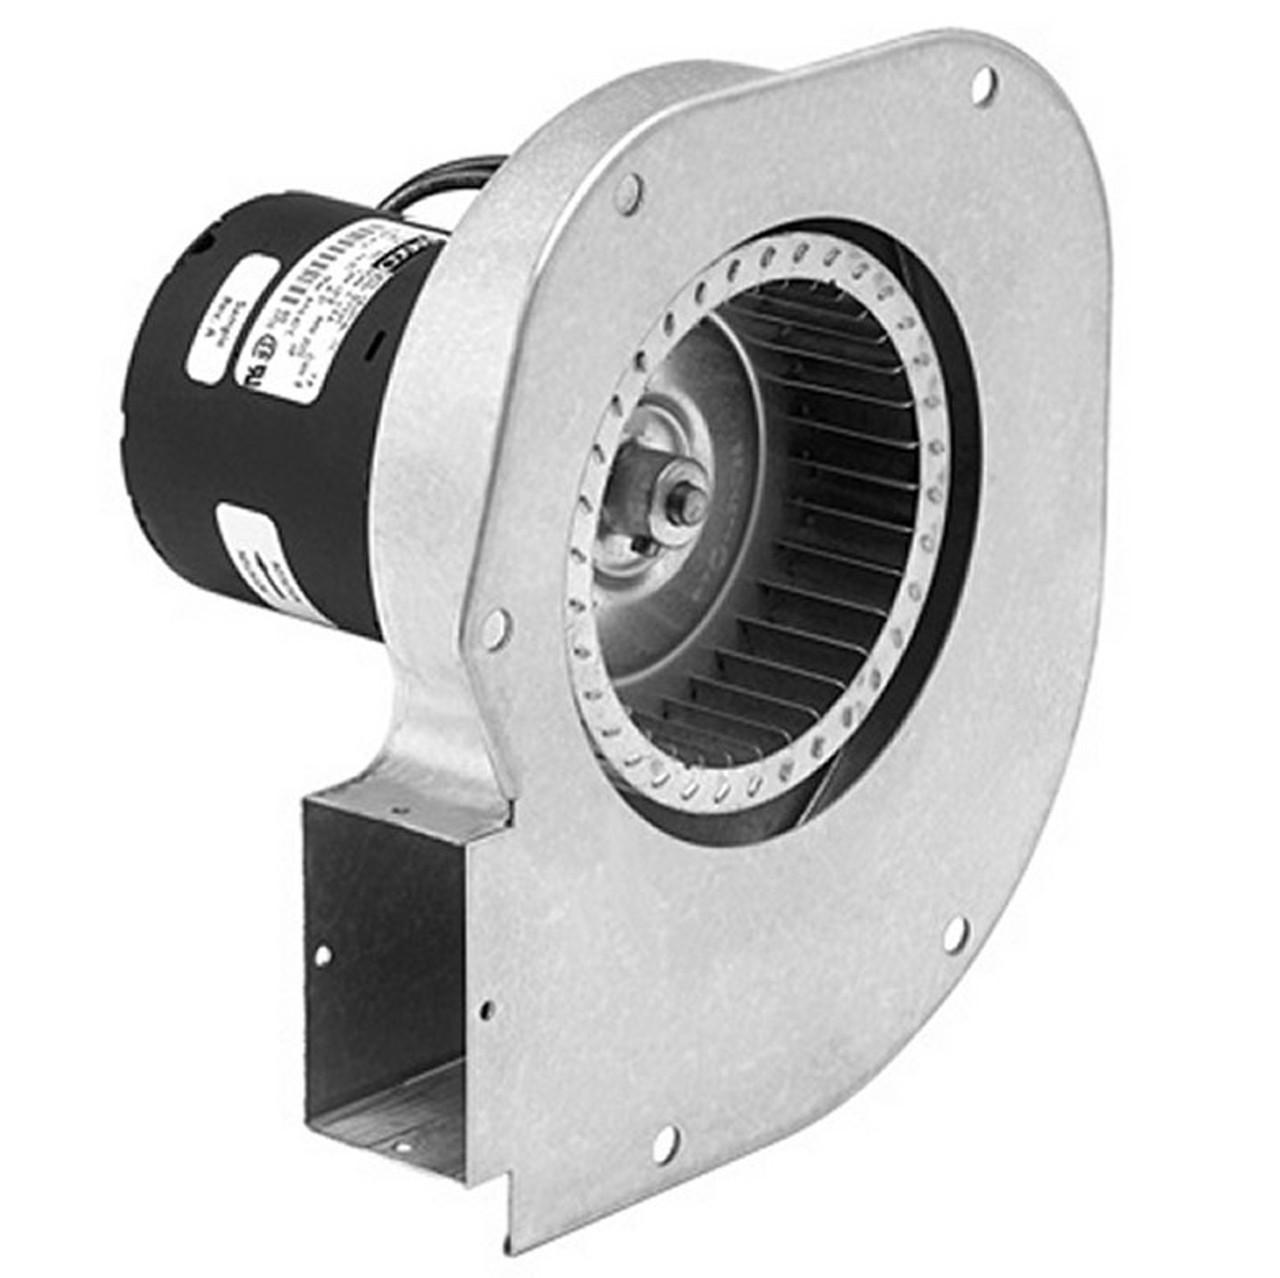 Nordyne Furnace Draft Inducer blower 240V (7021-10381, 6217930) Fasco # A121Electric Motor Warehouse